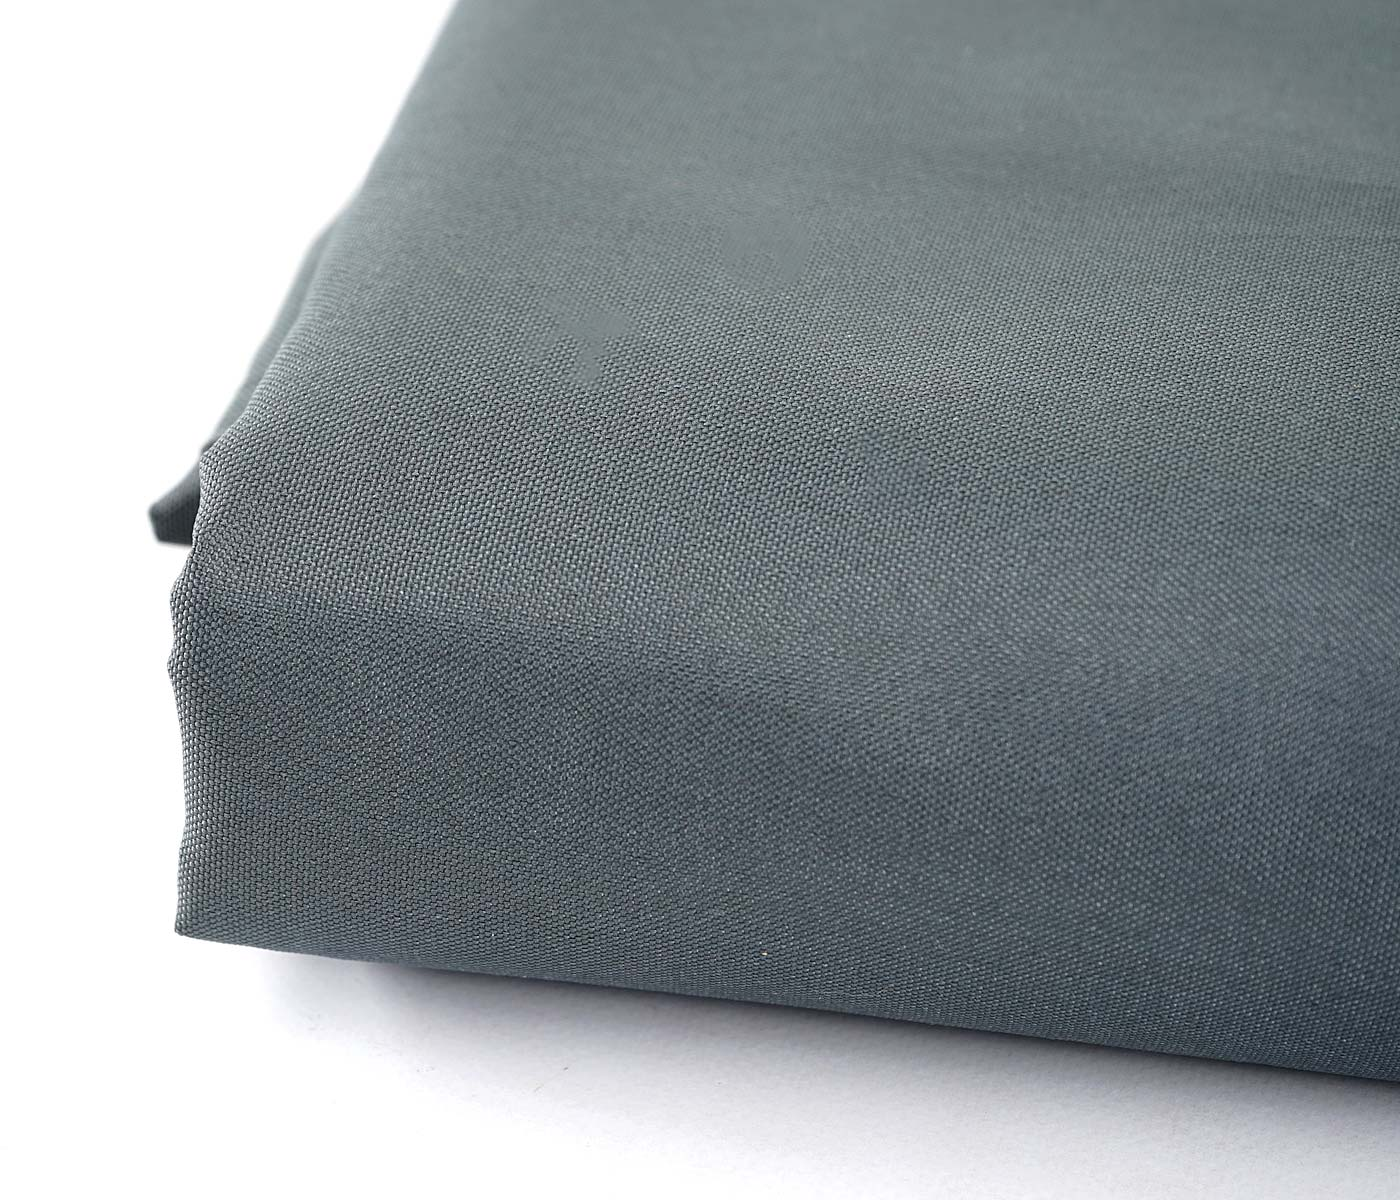 ersatzbezug f r dach pergola pavillon cabrera 3m grau. Black Bedroom Furniture Sets. Home Design Ideas